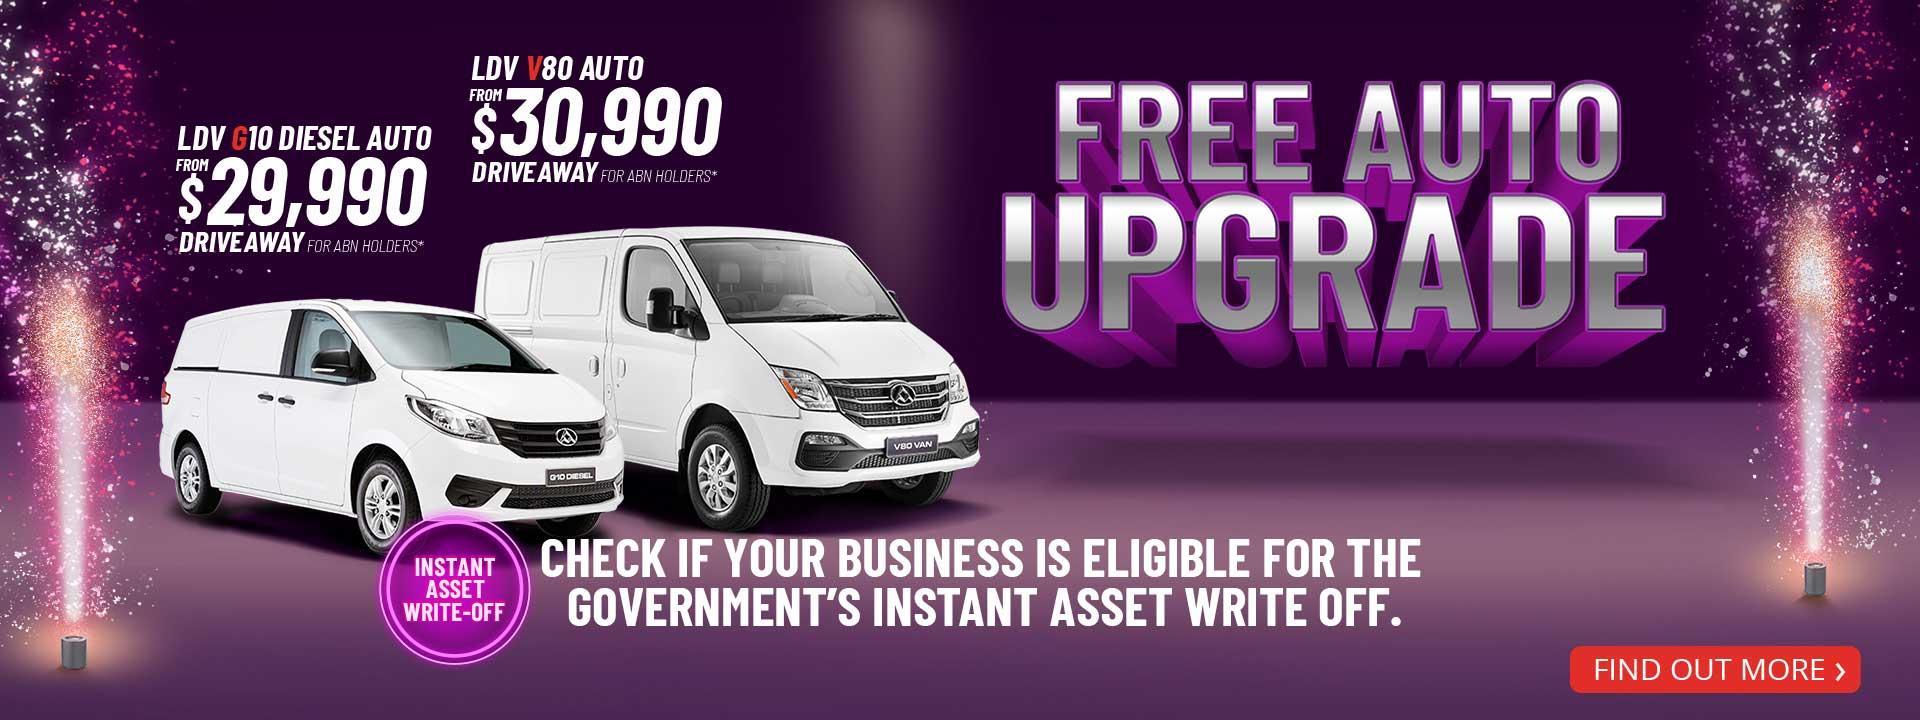 LDV - Free Auto Upgrade